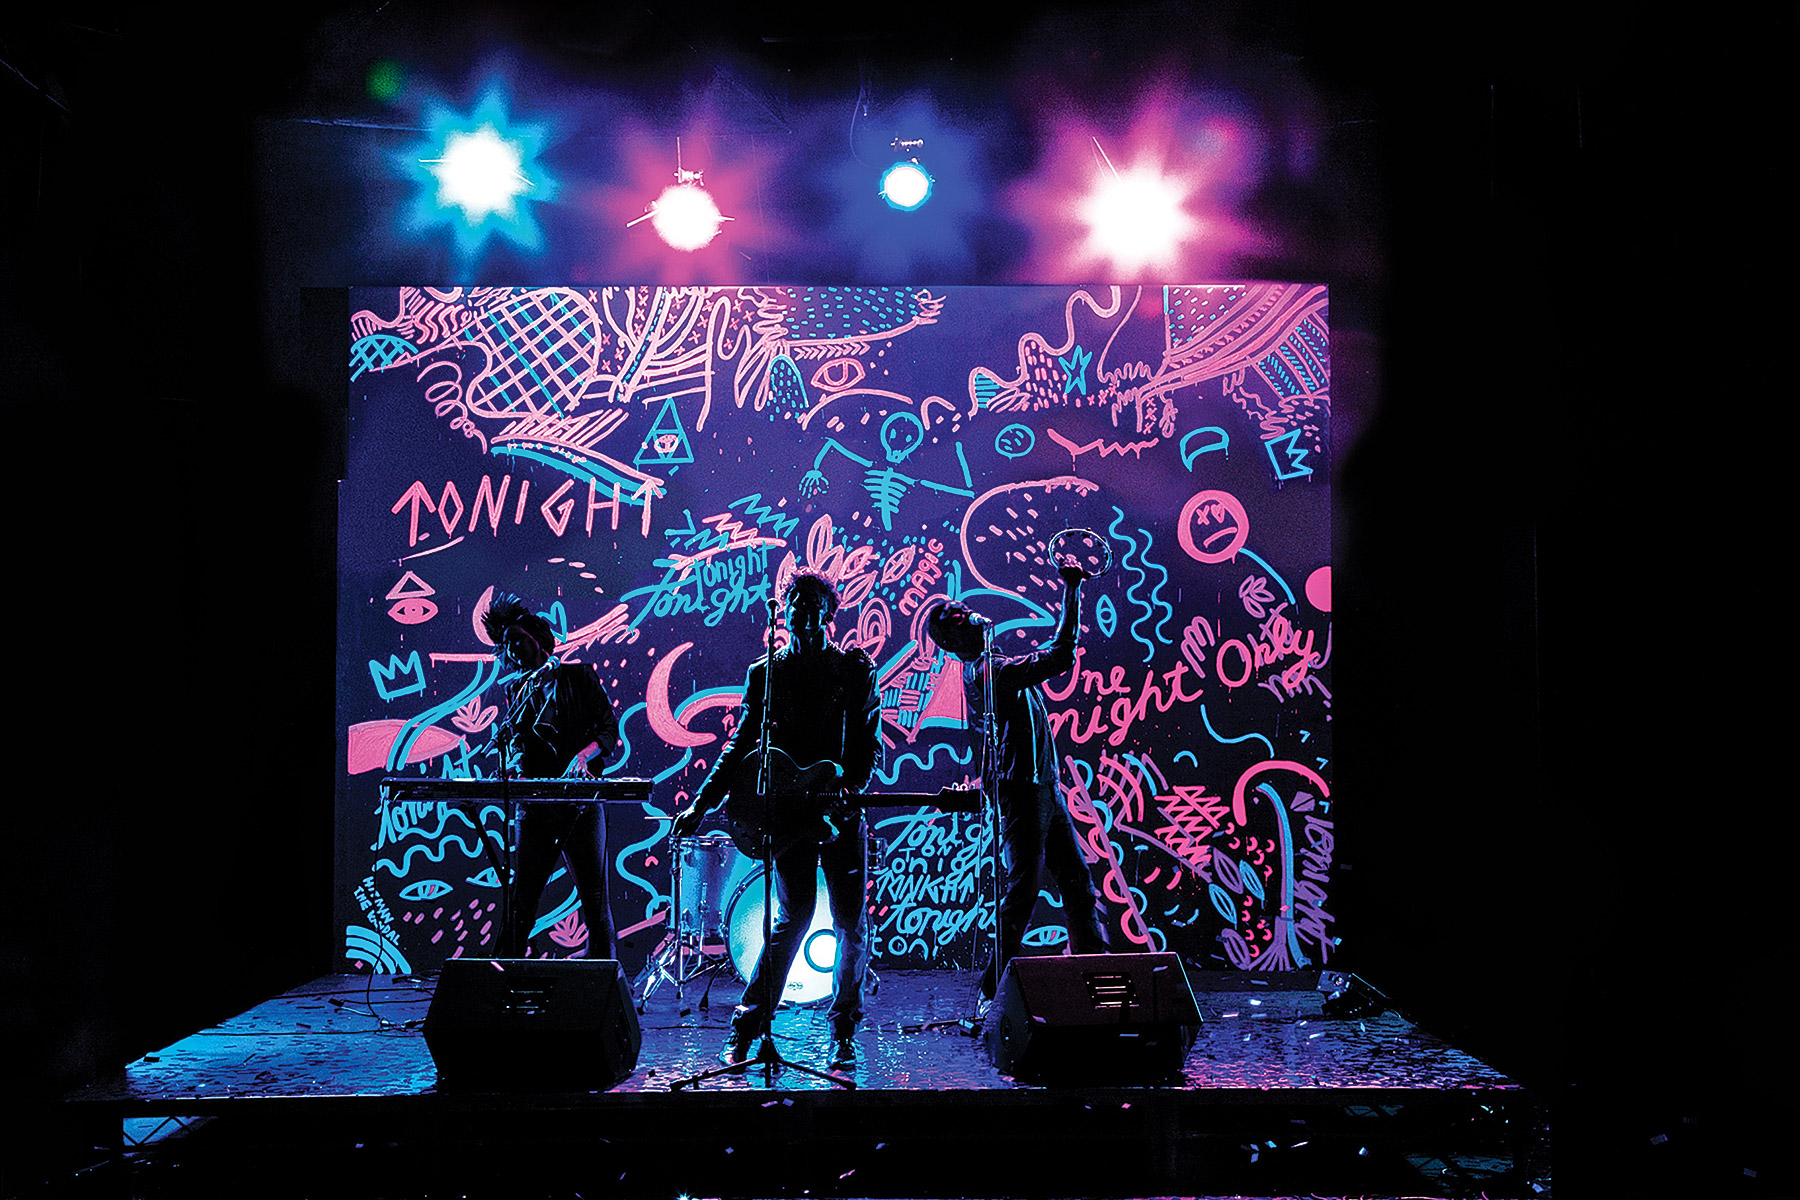 Smirnoff Midnight Circus: The Show